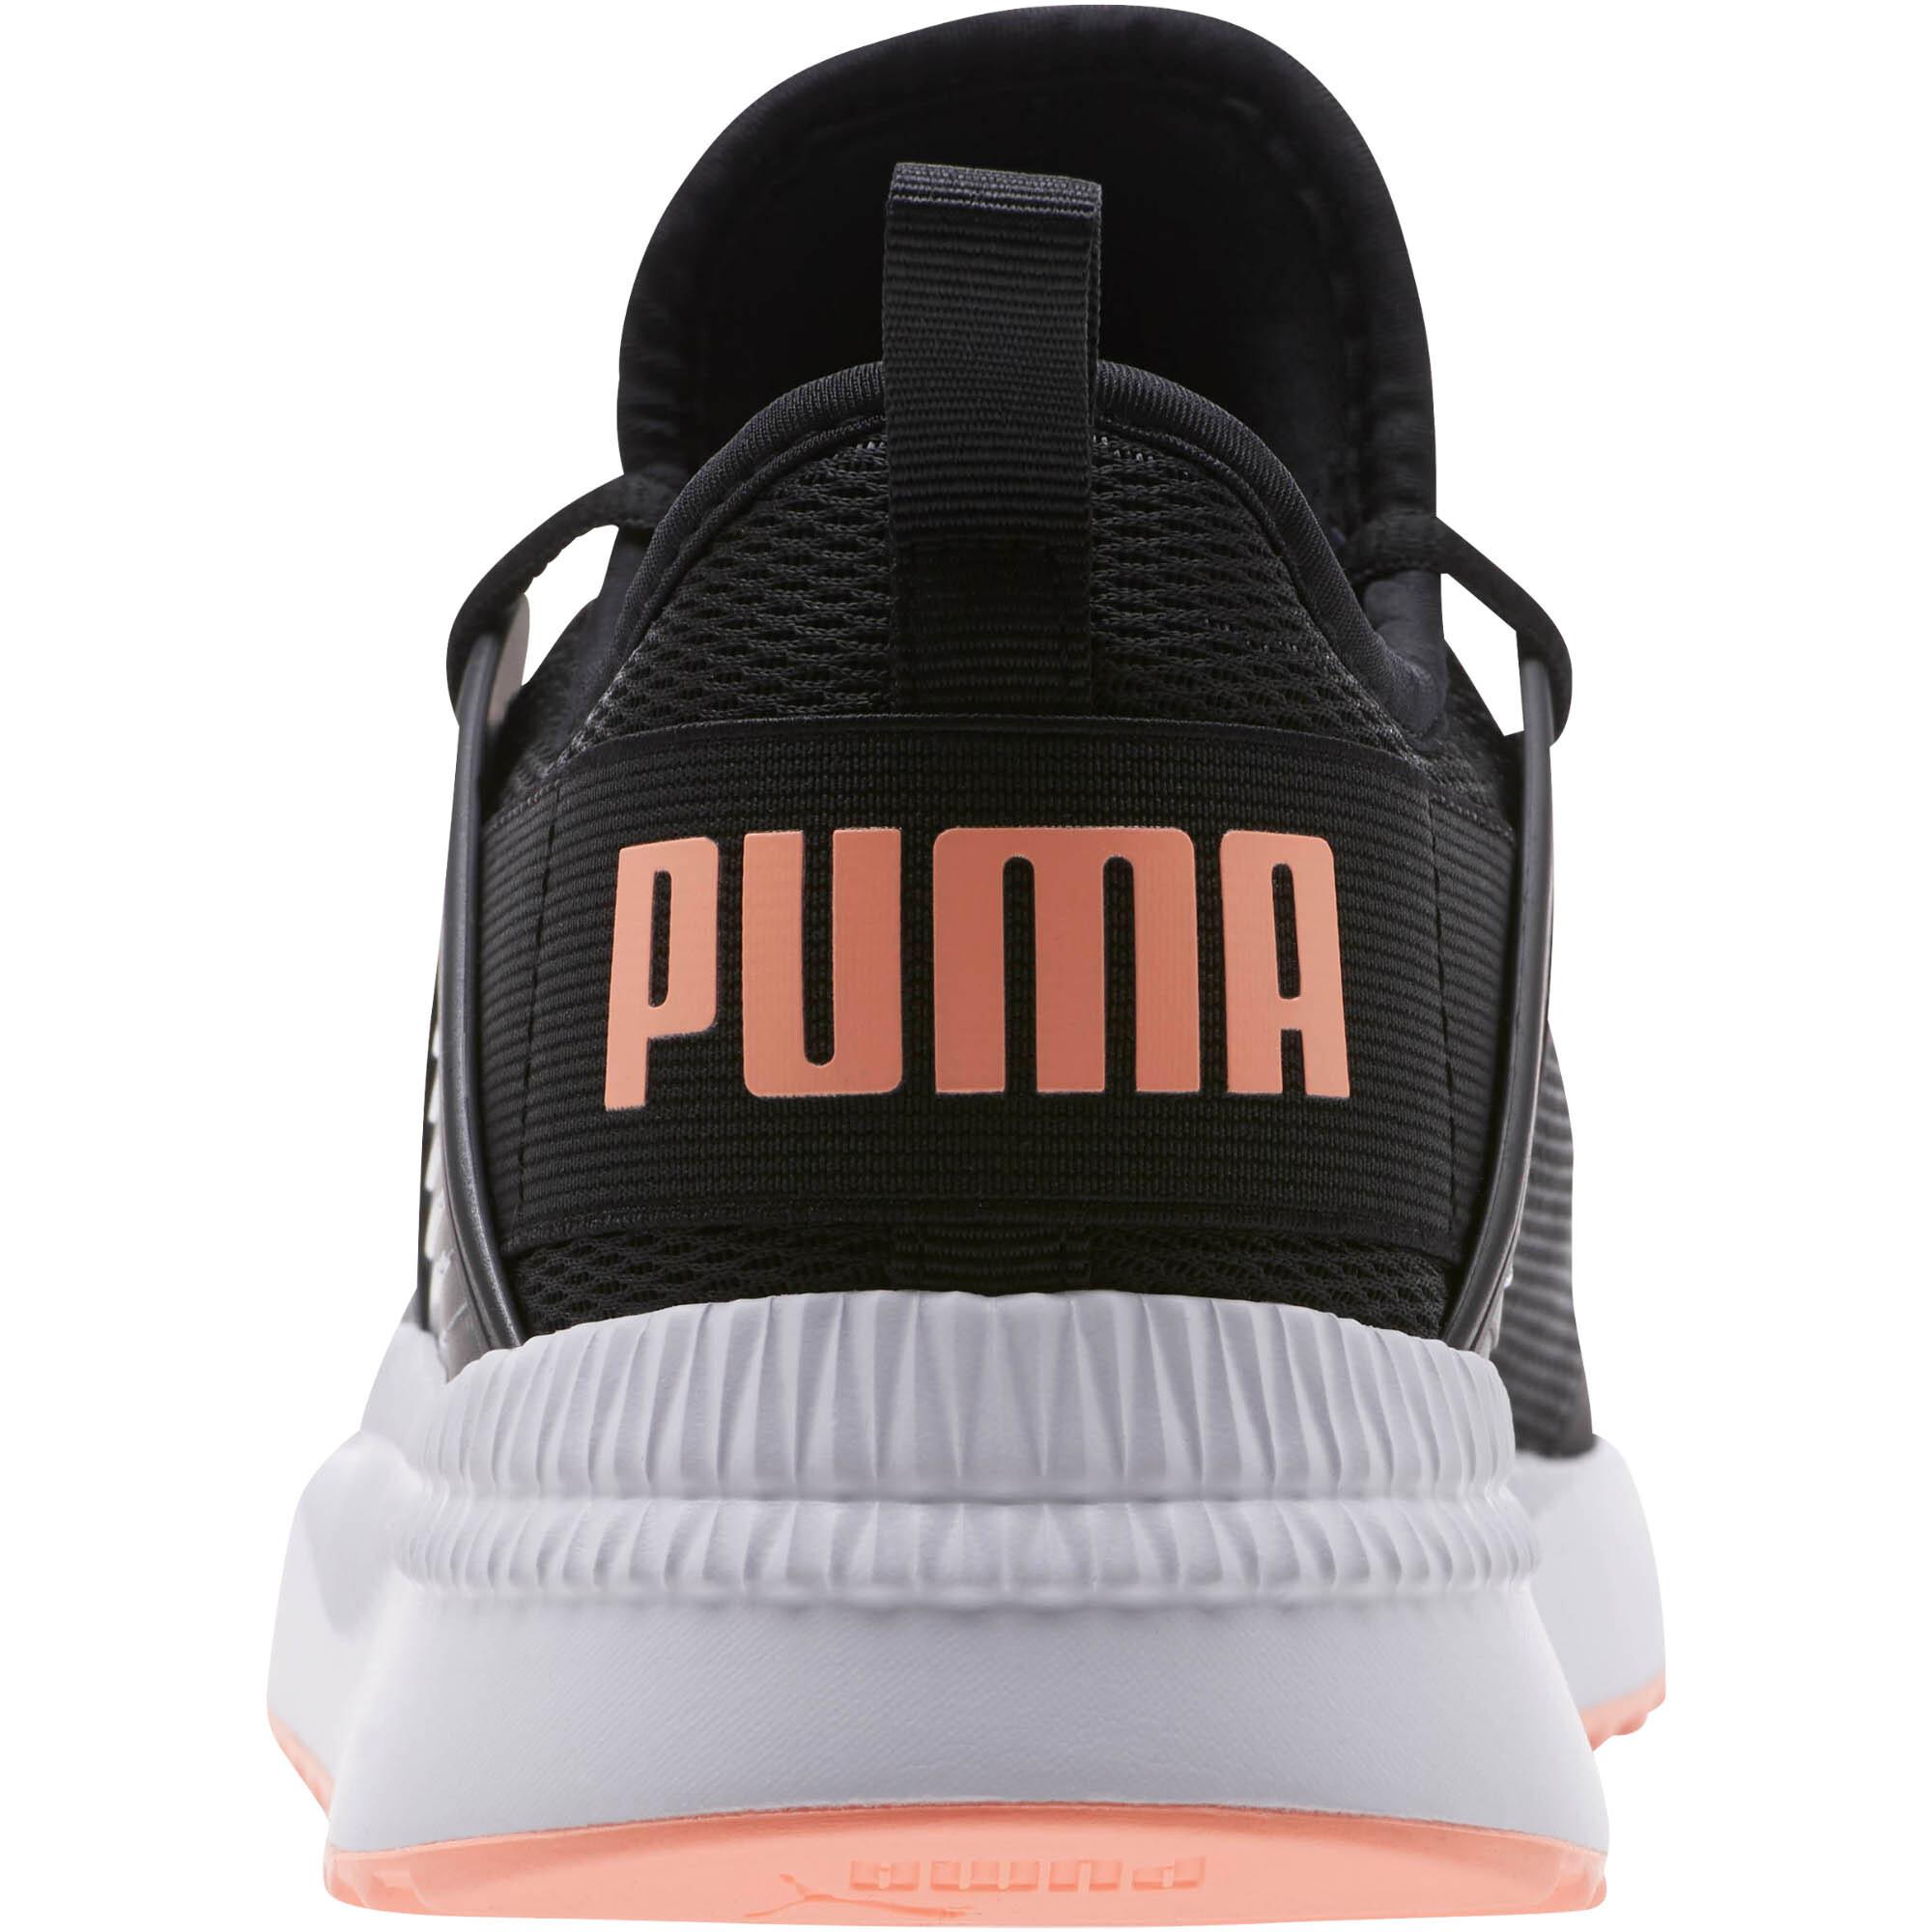 PUMA-Pacer-Next-Cage-Sneakers-Men-Shoe-Basics thumbnail 13